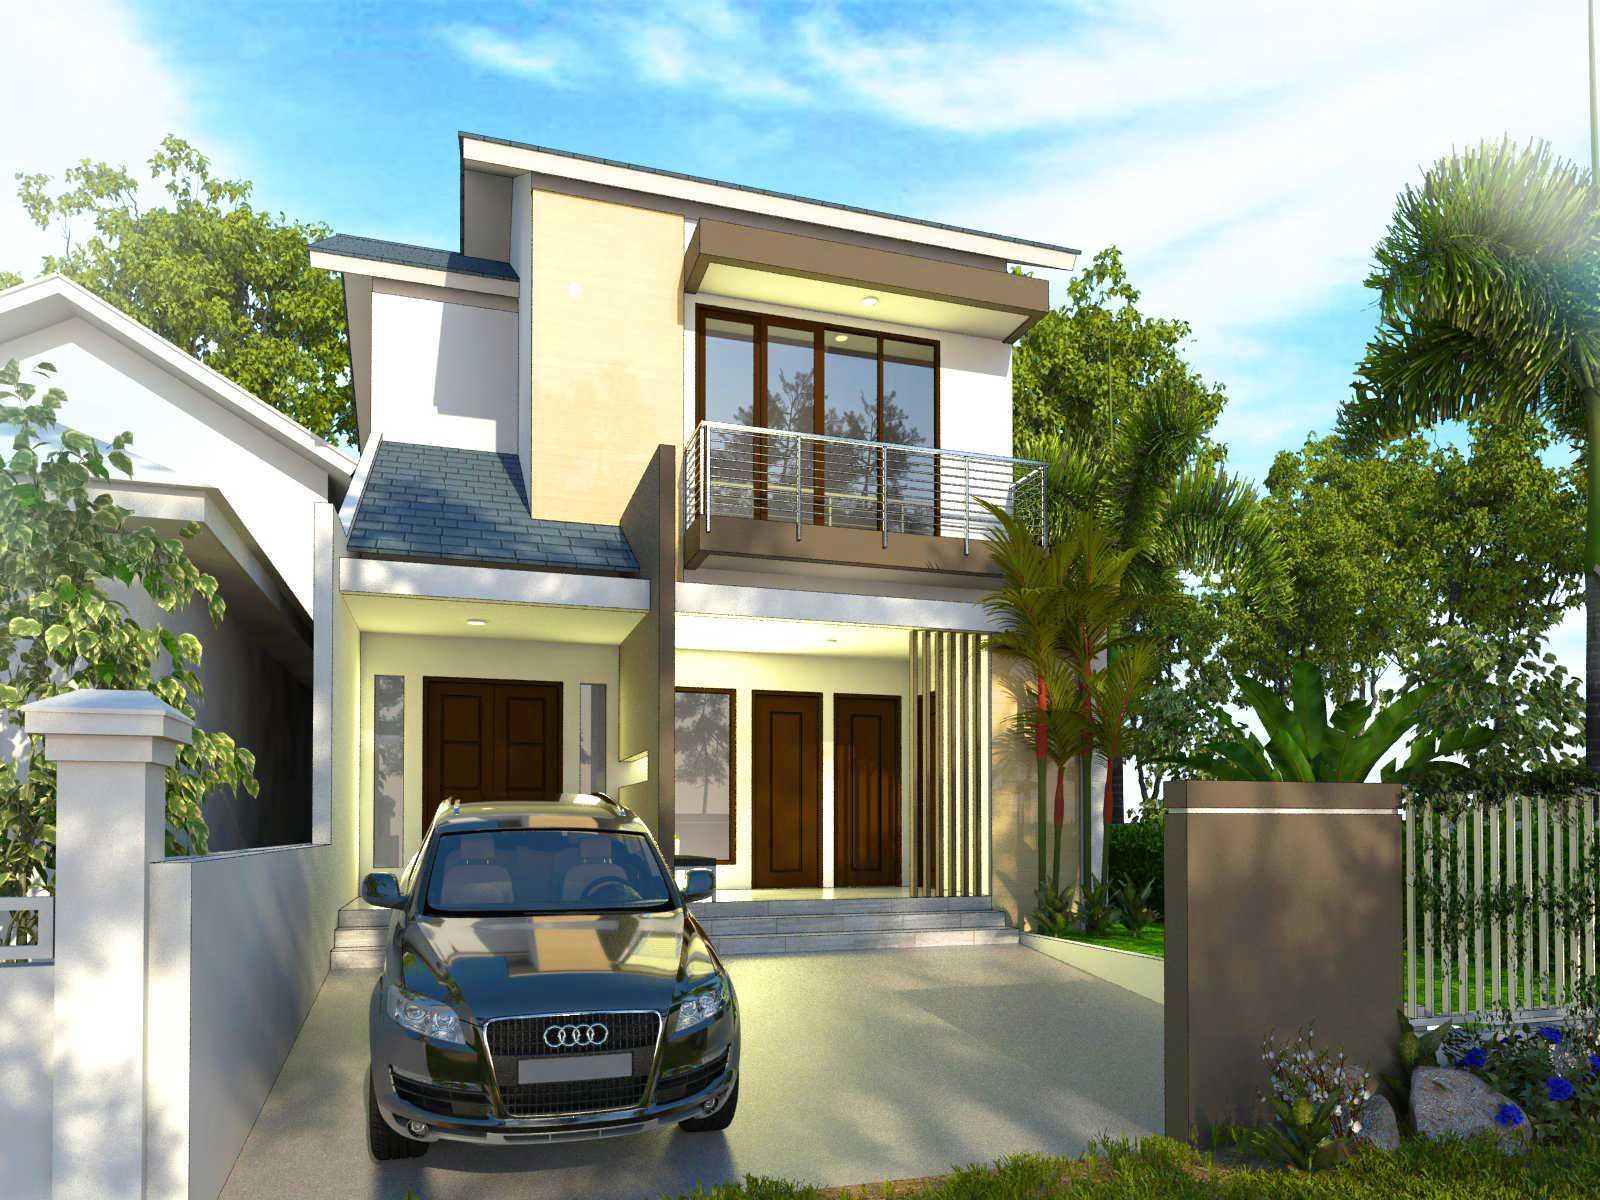 Artisia Studio House Of Mr Iwan (Samarinda) Kota Samarinda, Kalimantan Timur, Indonesia Kota Samarinda, Kalimantan Timur, Indonesia Artisia-Studio-House-Of-Mr-Iwan-Samarinda   80218